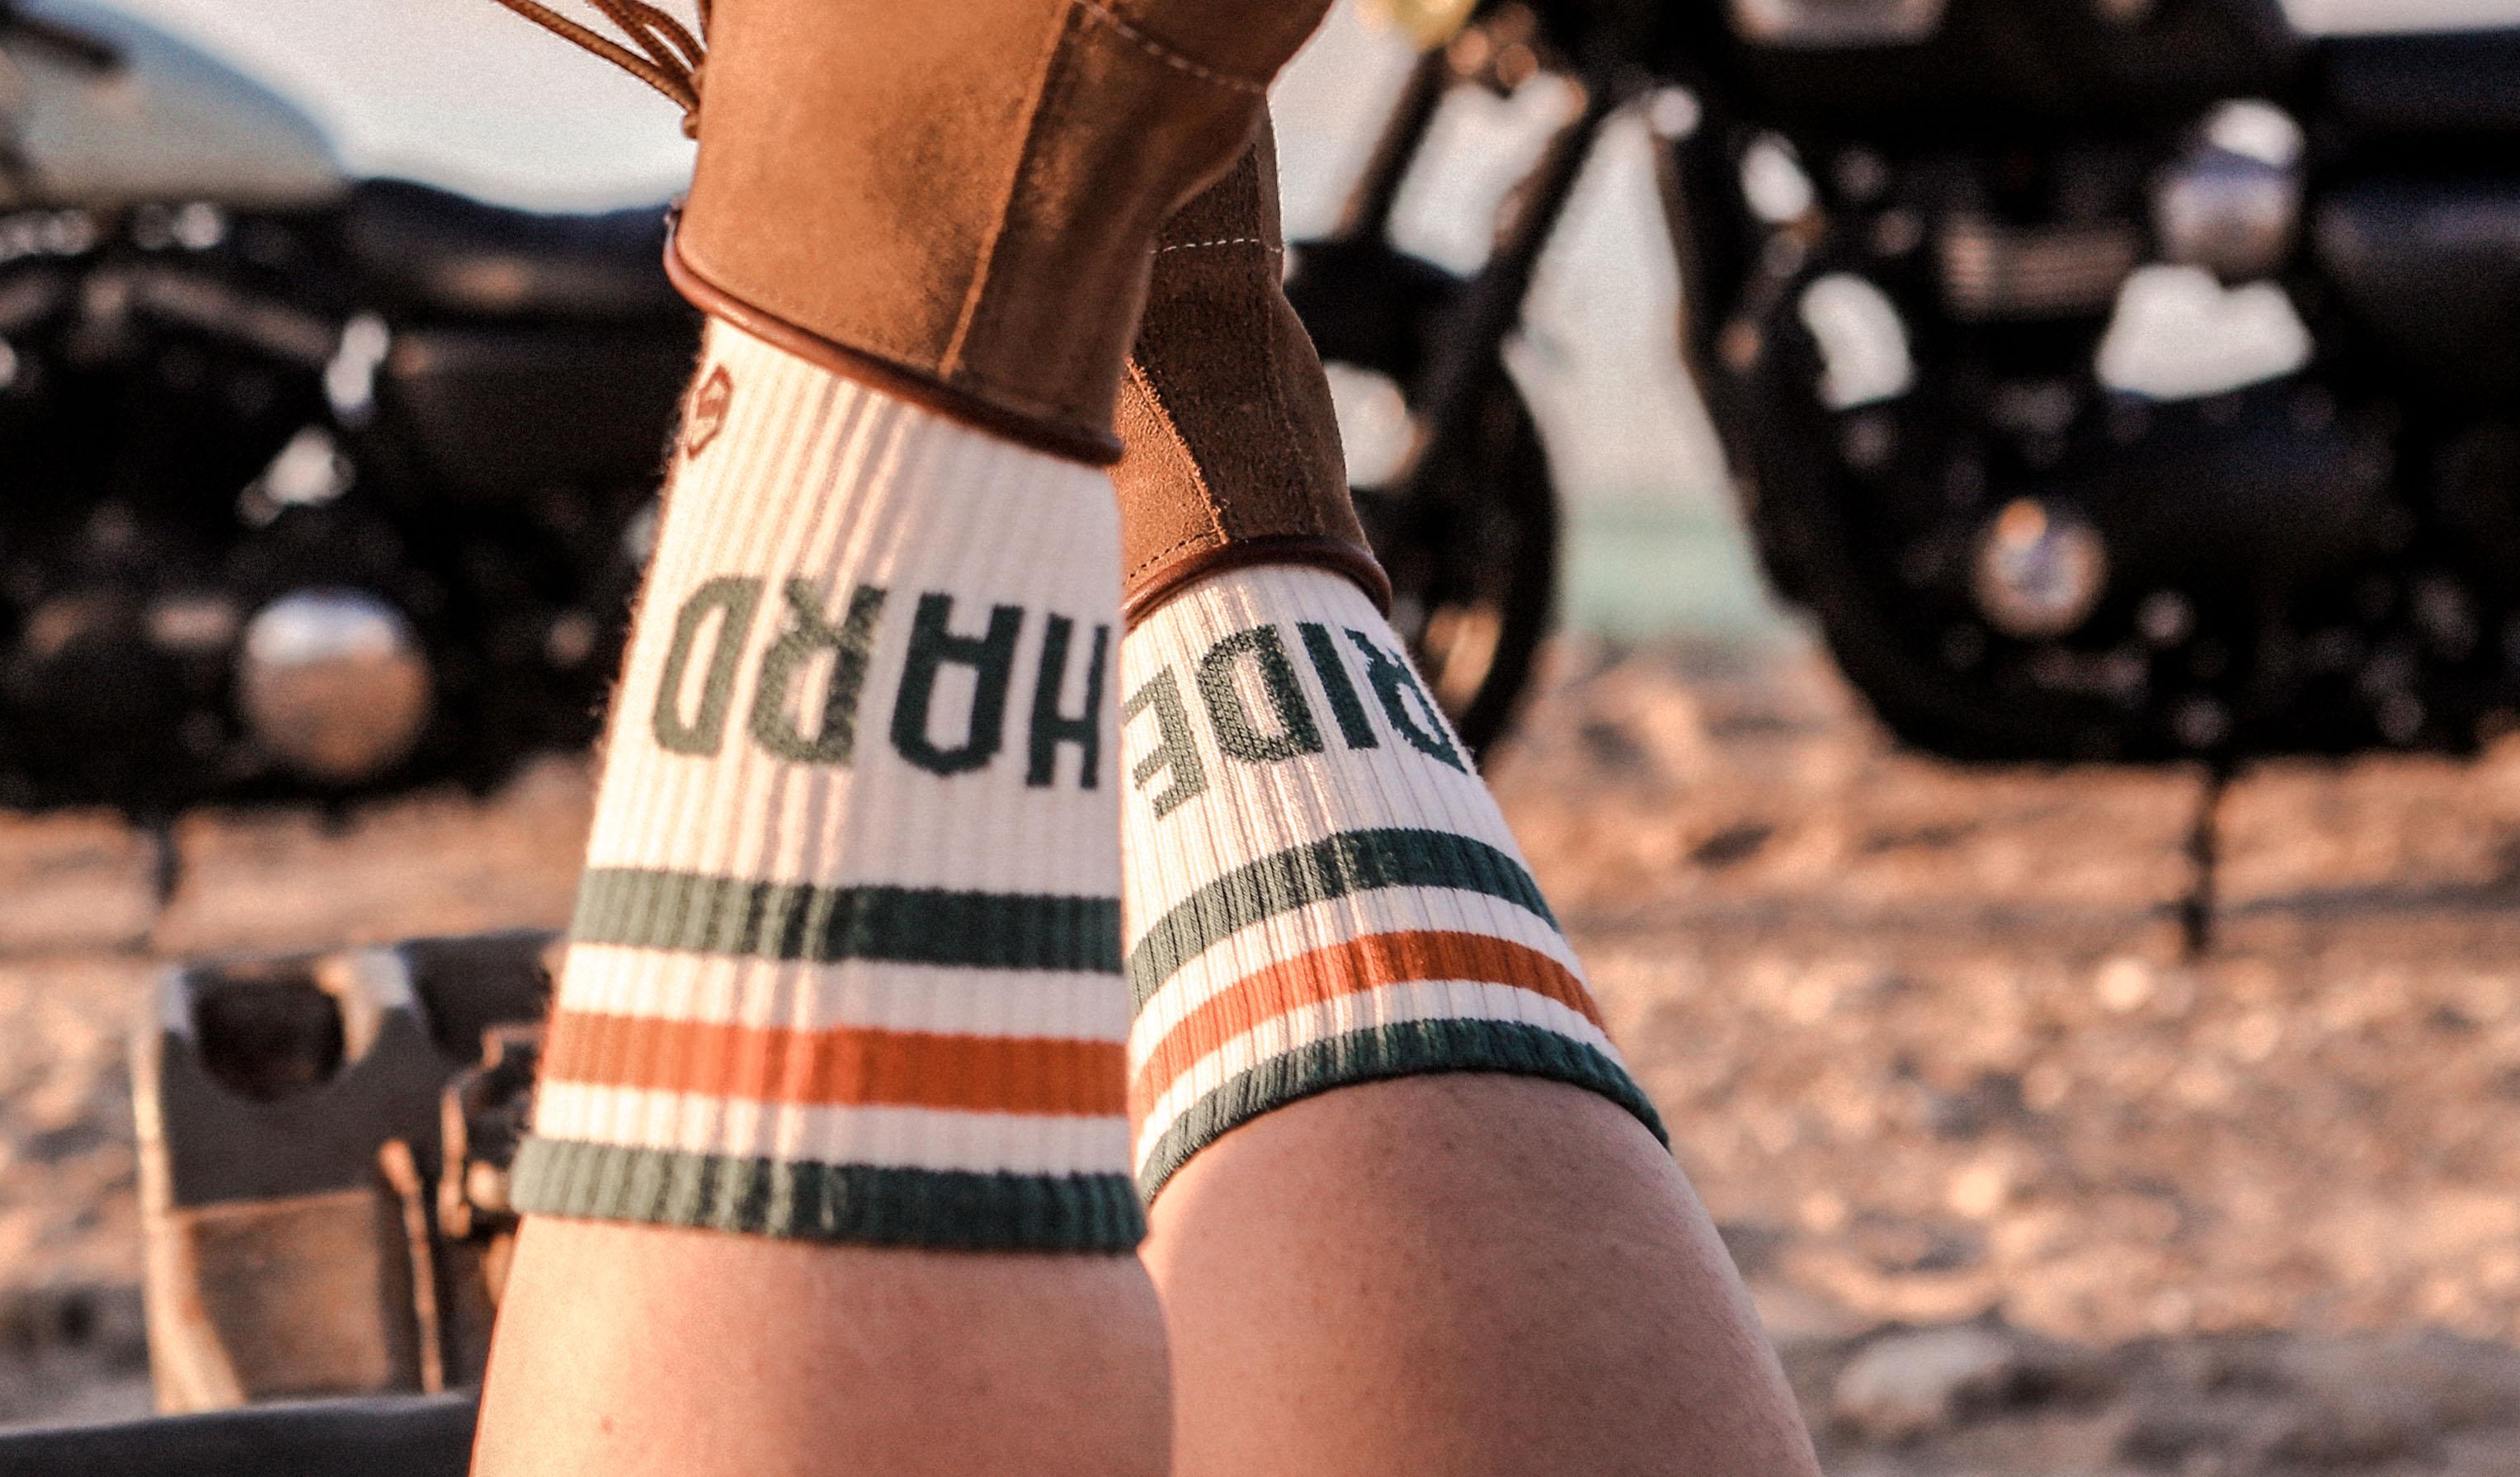 chaussettes ride hard coton